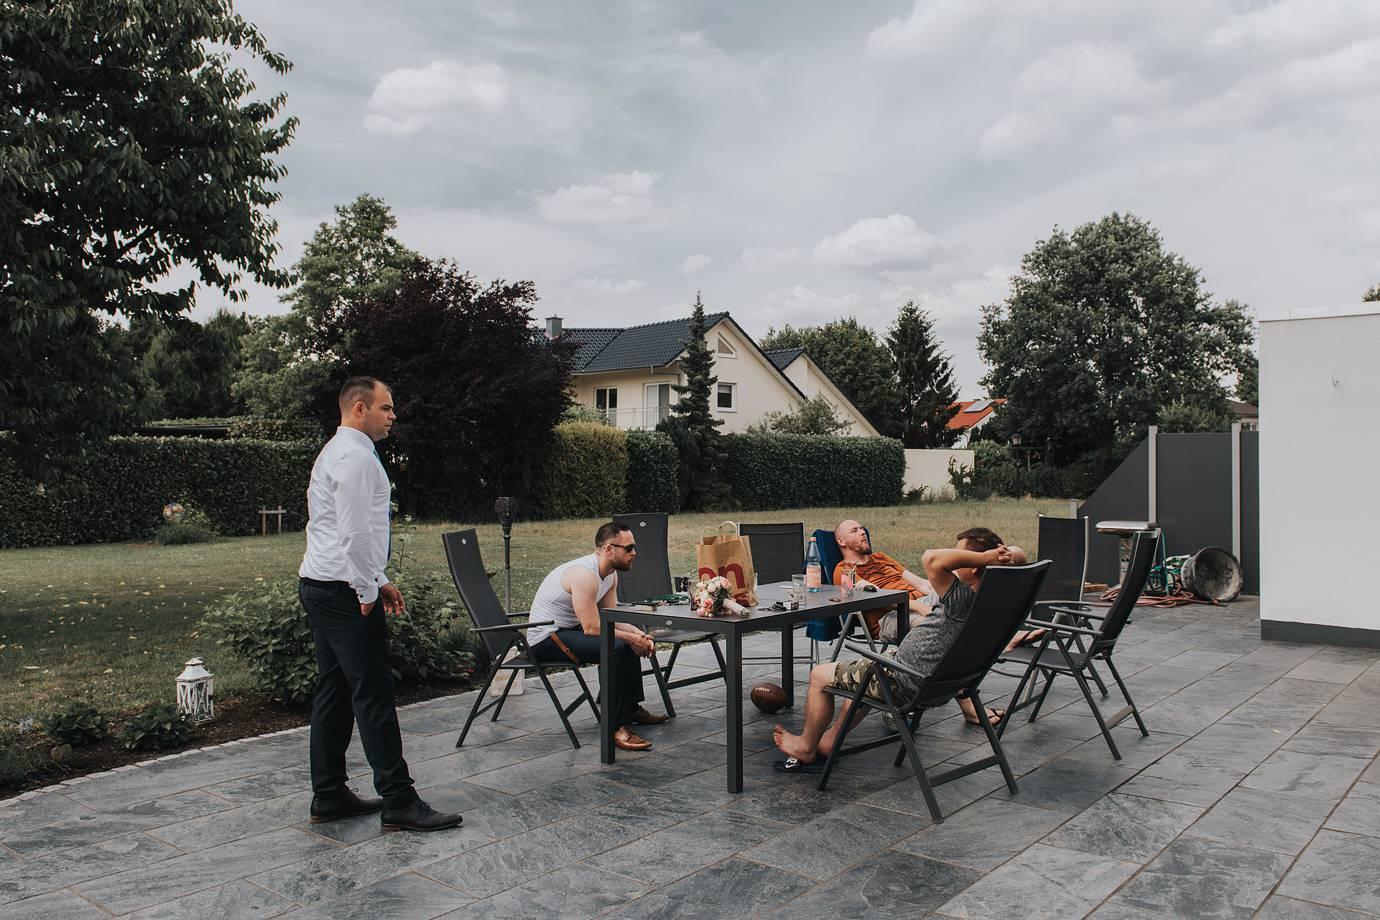 hochzeitsfotograf weyhe 156 - Ricarda+Hendrik